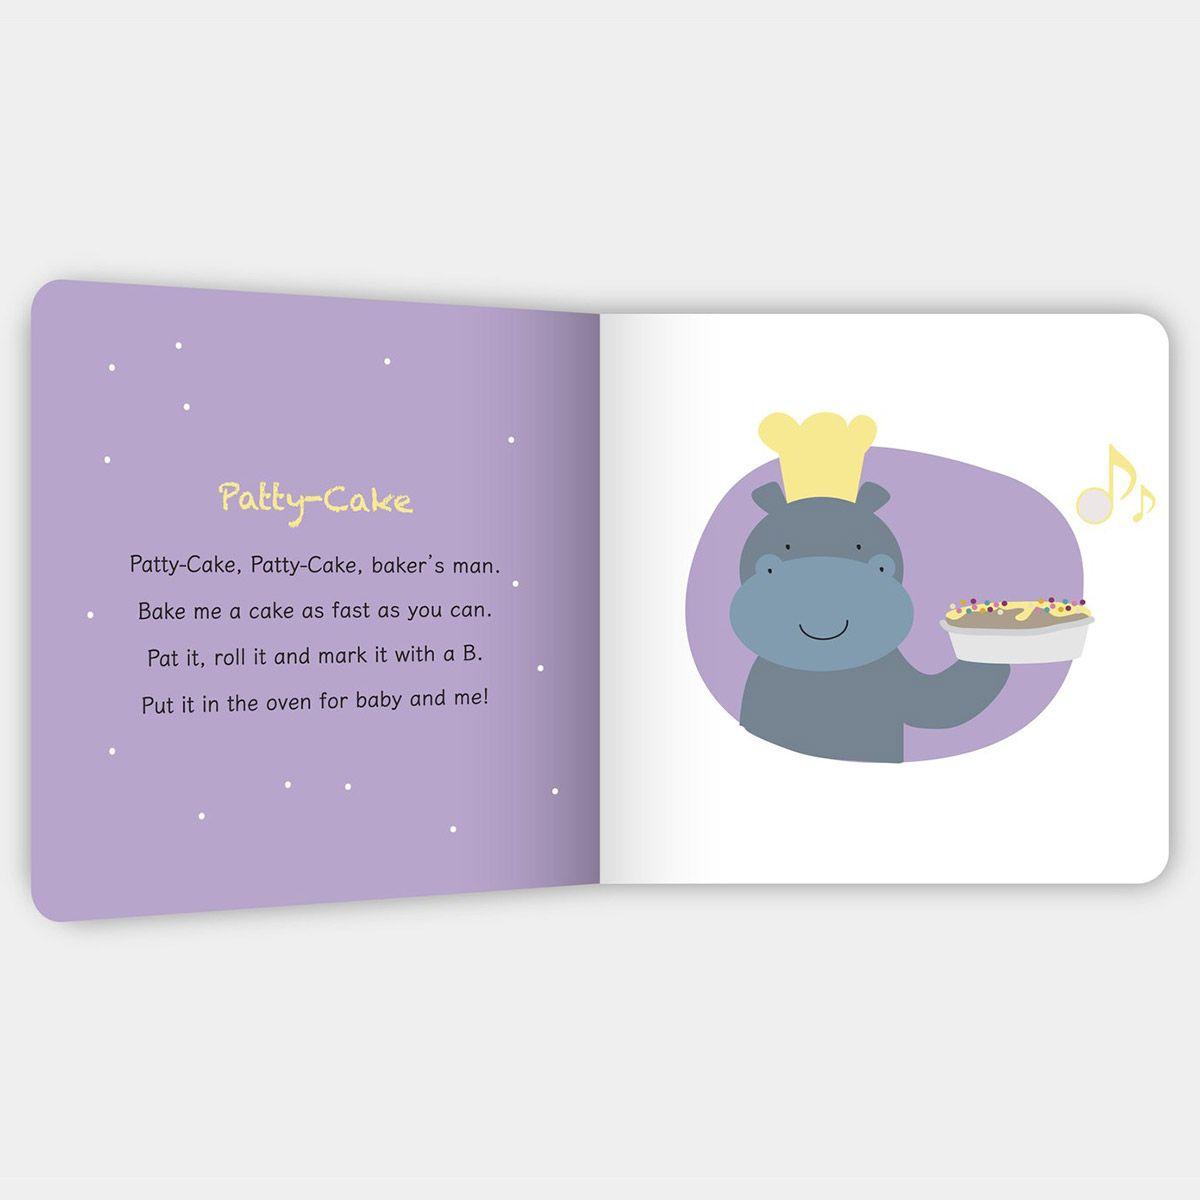 Nursery Rhymes Google Search Patty Cake Nursery Rhyme